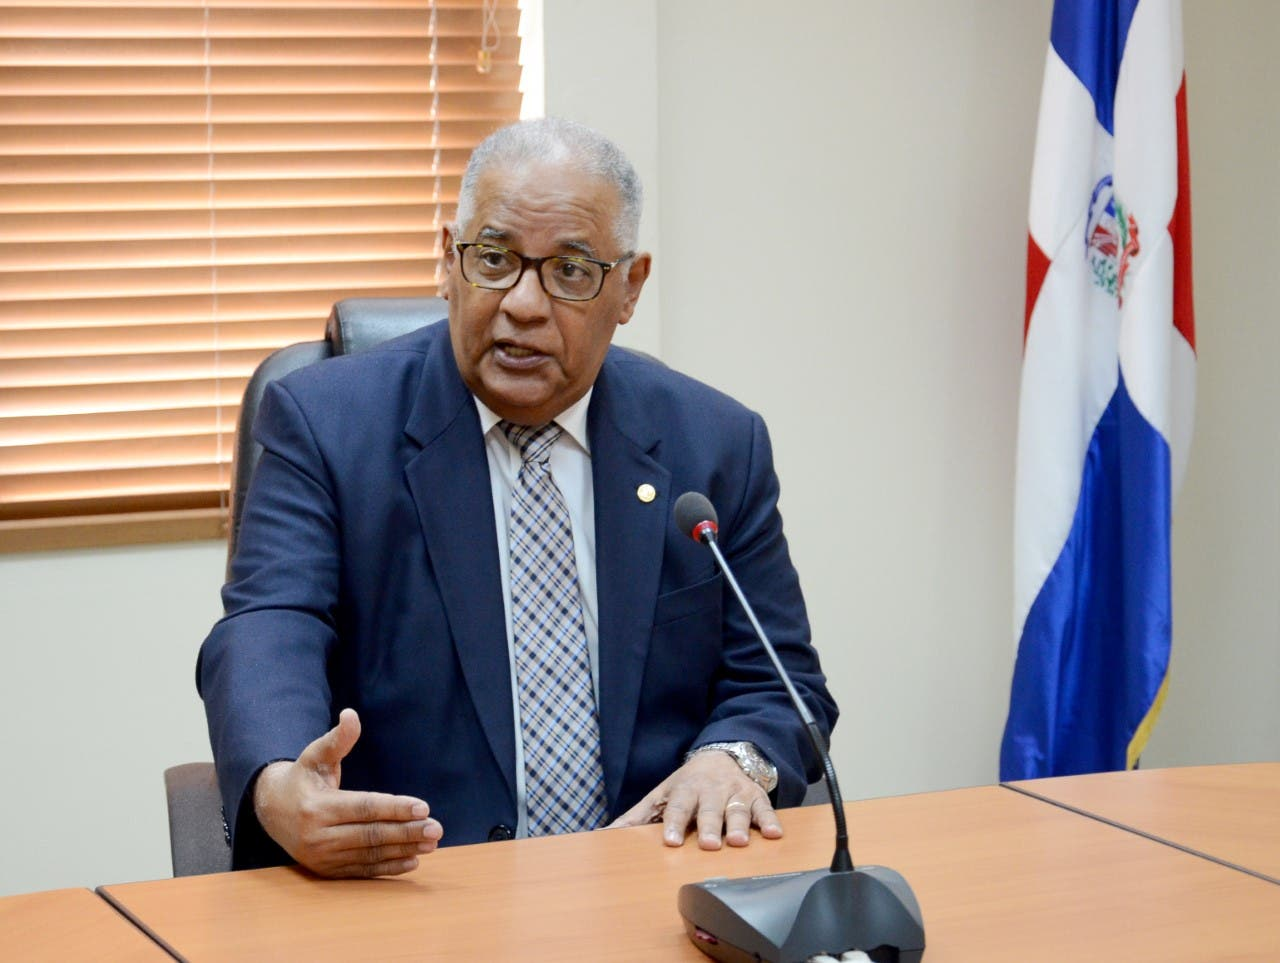 Gerente del CNSS espera Andeclip retire medida